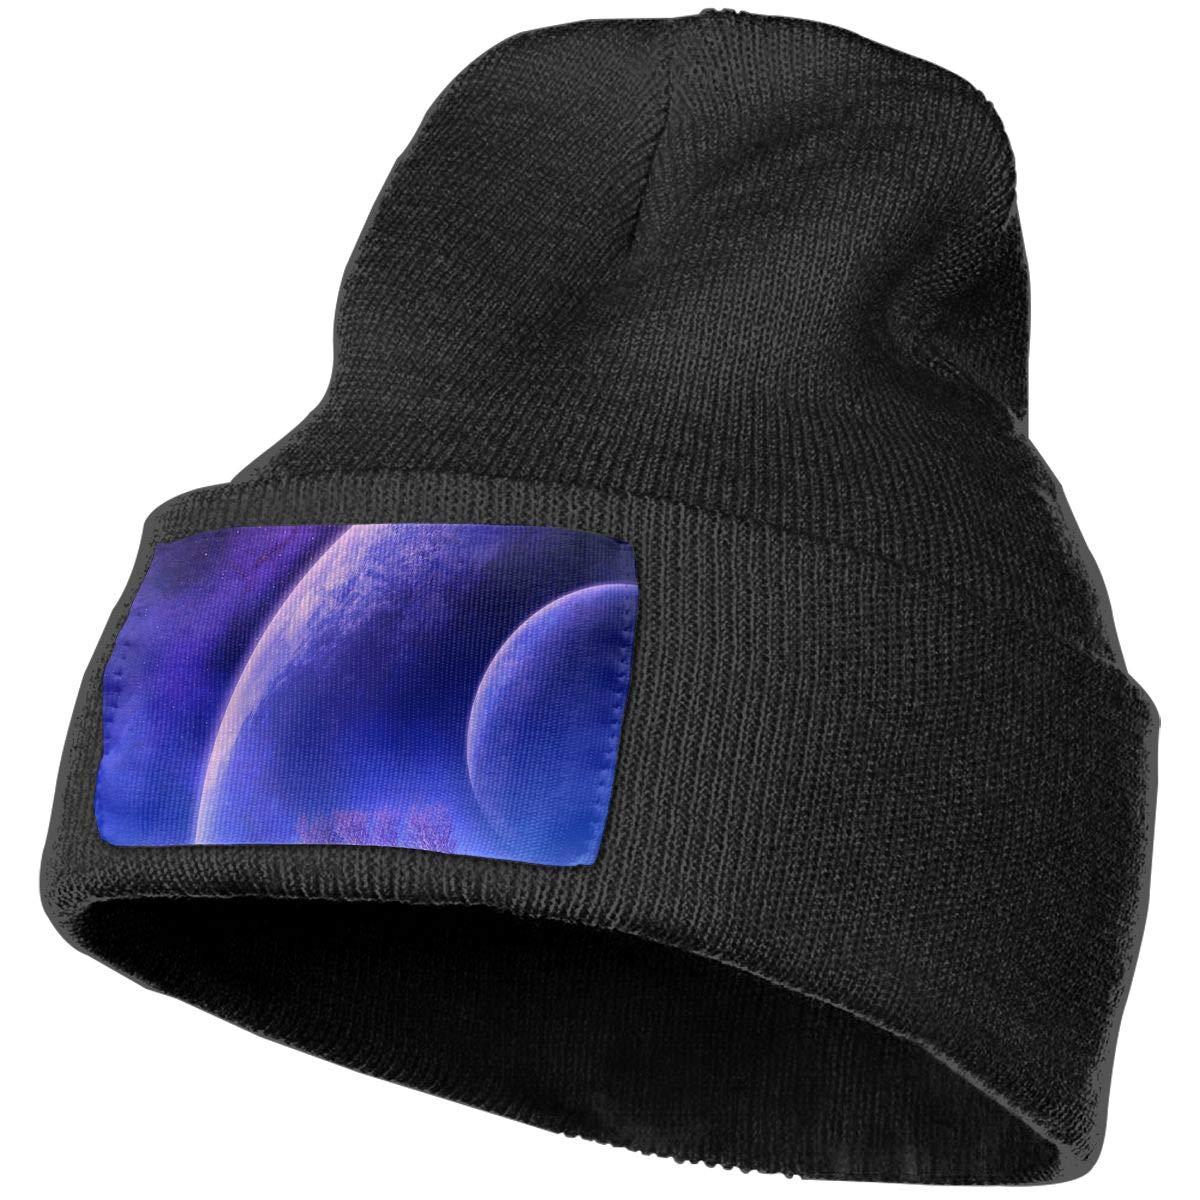 100/% Acrylic Acid Mas Beanie Hat Ruin The Vast Planet Fashion Knitting Hat for Men Women